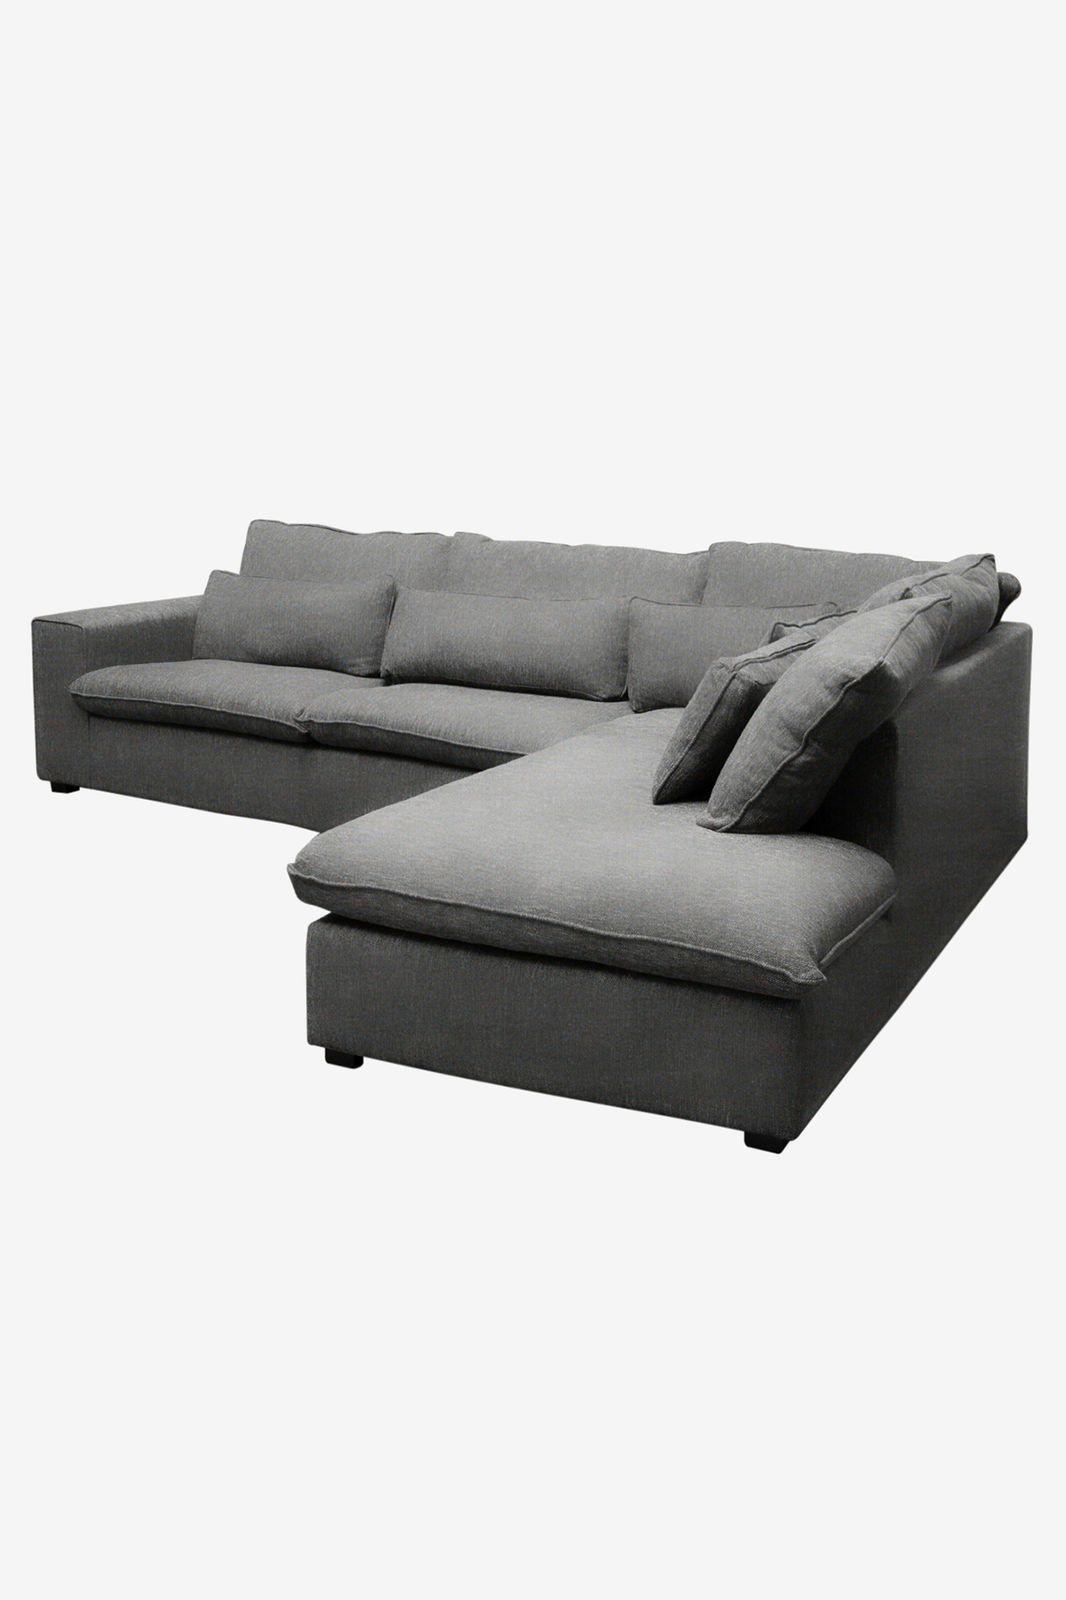 Baron bank 3.5-zits lounge rechts donkergrijs